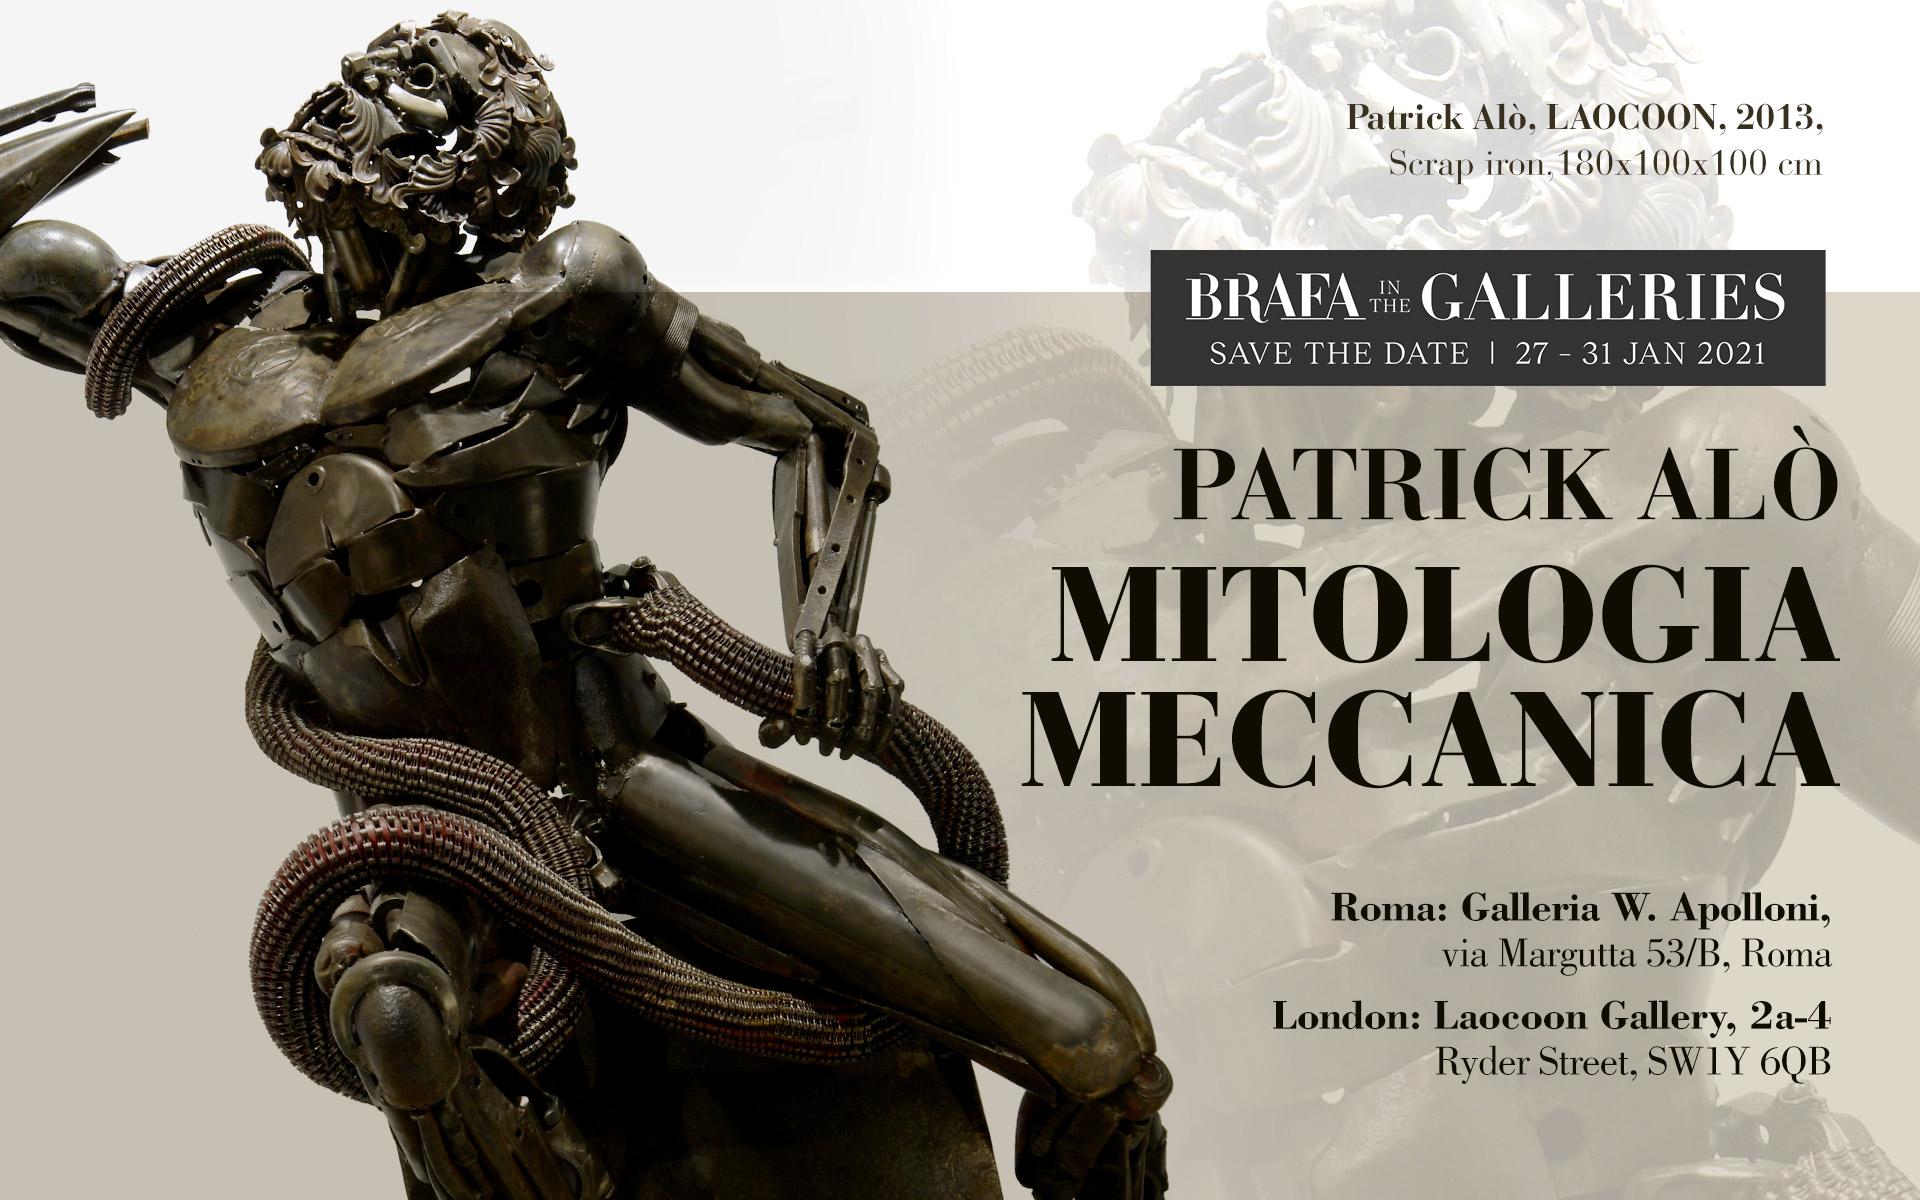 BRAFA in the Galleries 2021